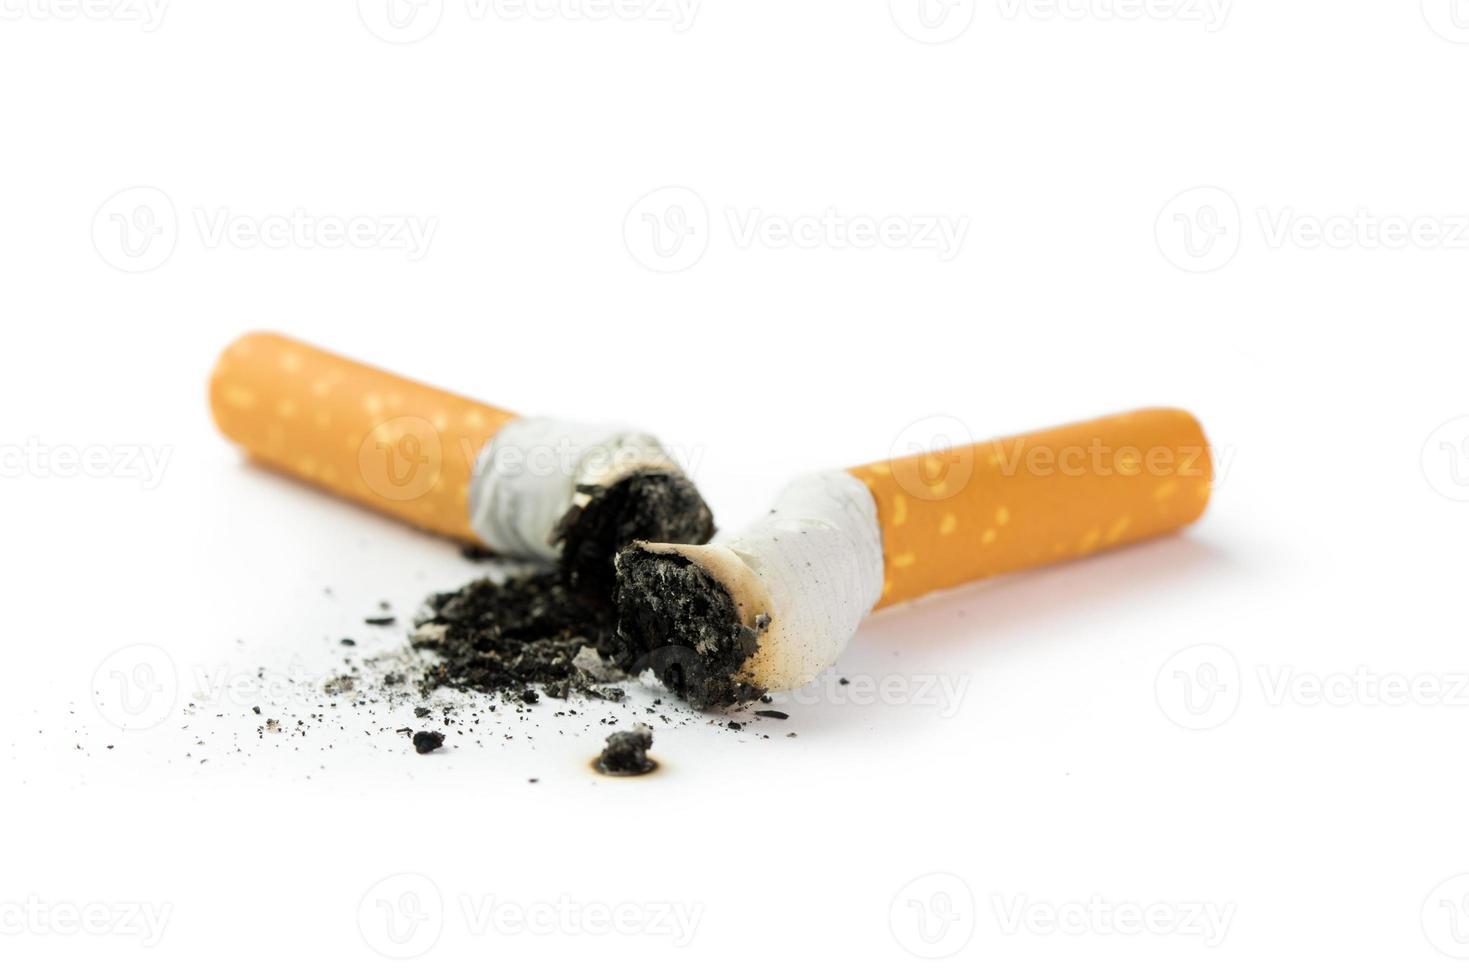 sigarettenpeuk met as foto